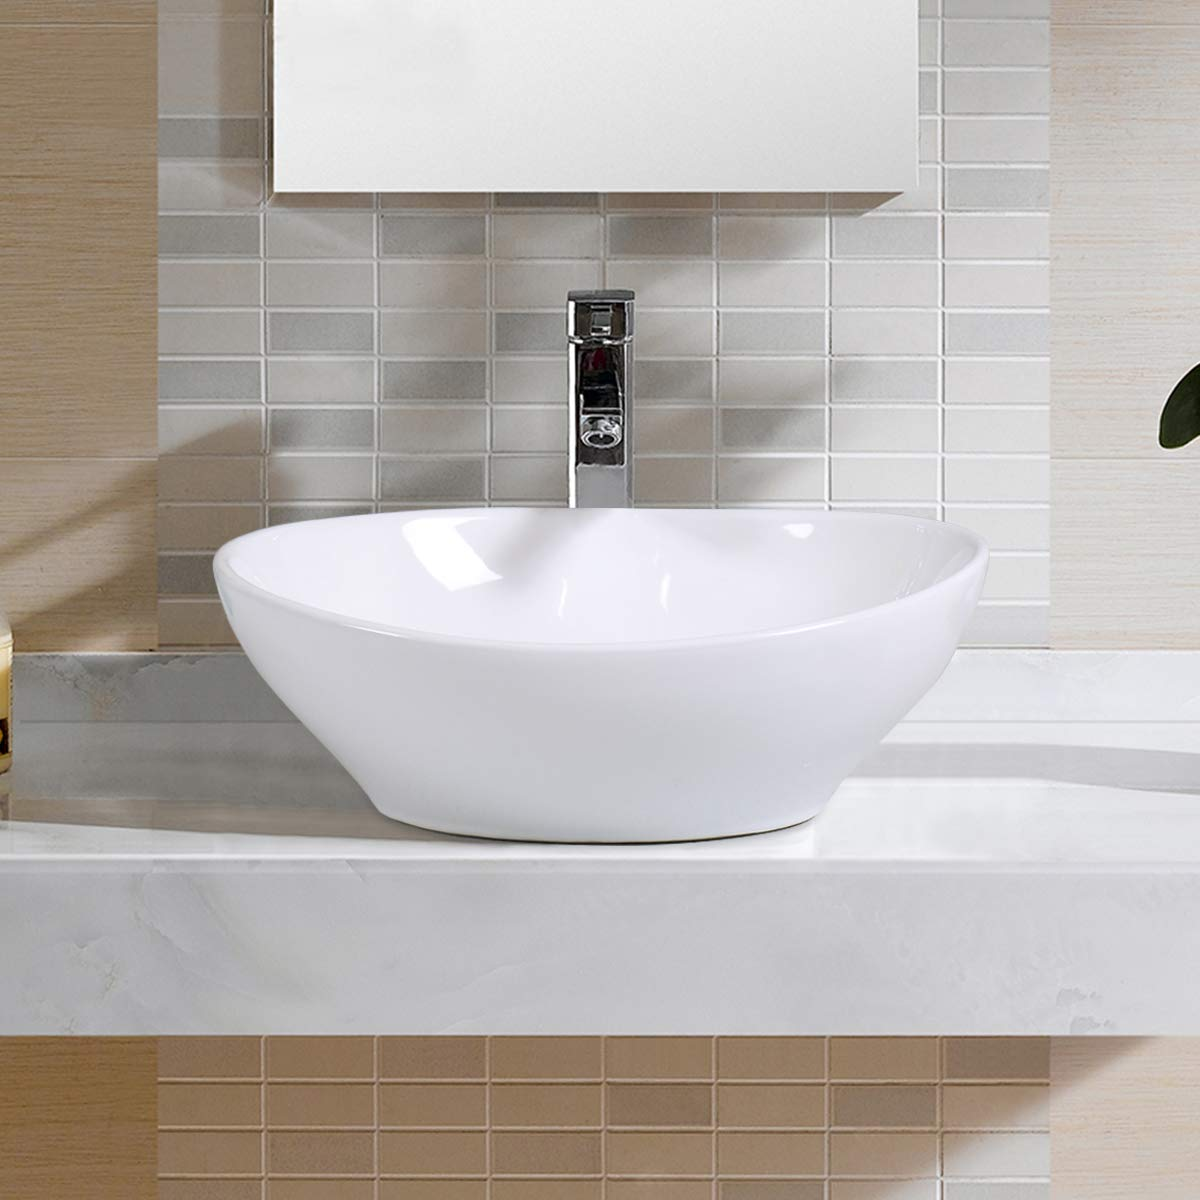 Giantex Oval Bathroom Basin Ceramic Vessel Sink Bowl Vanity Porcelain w Pop Up Drain